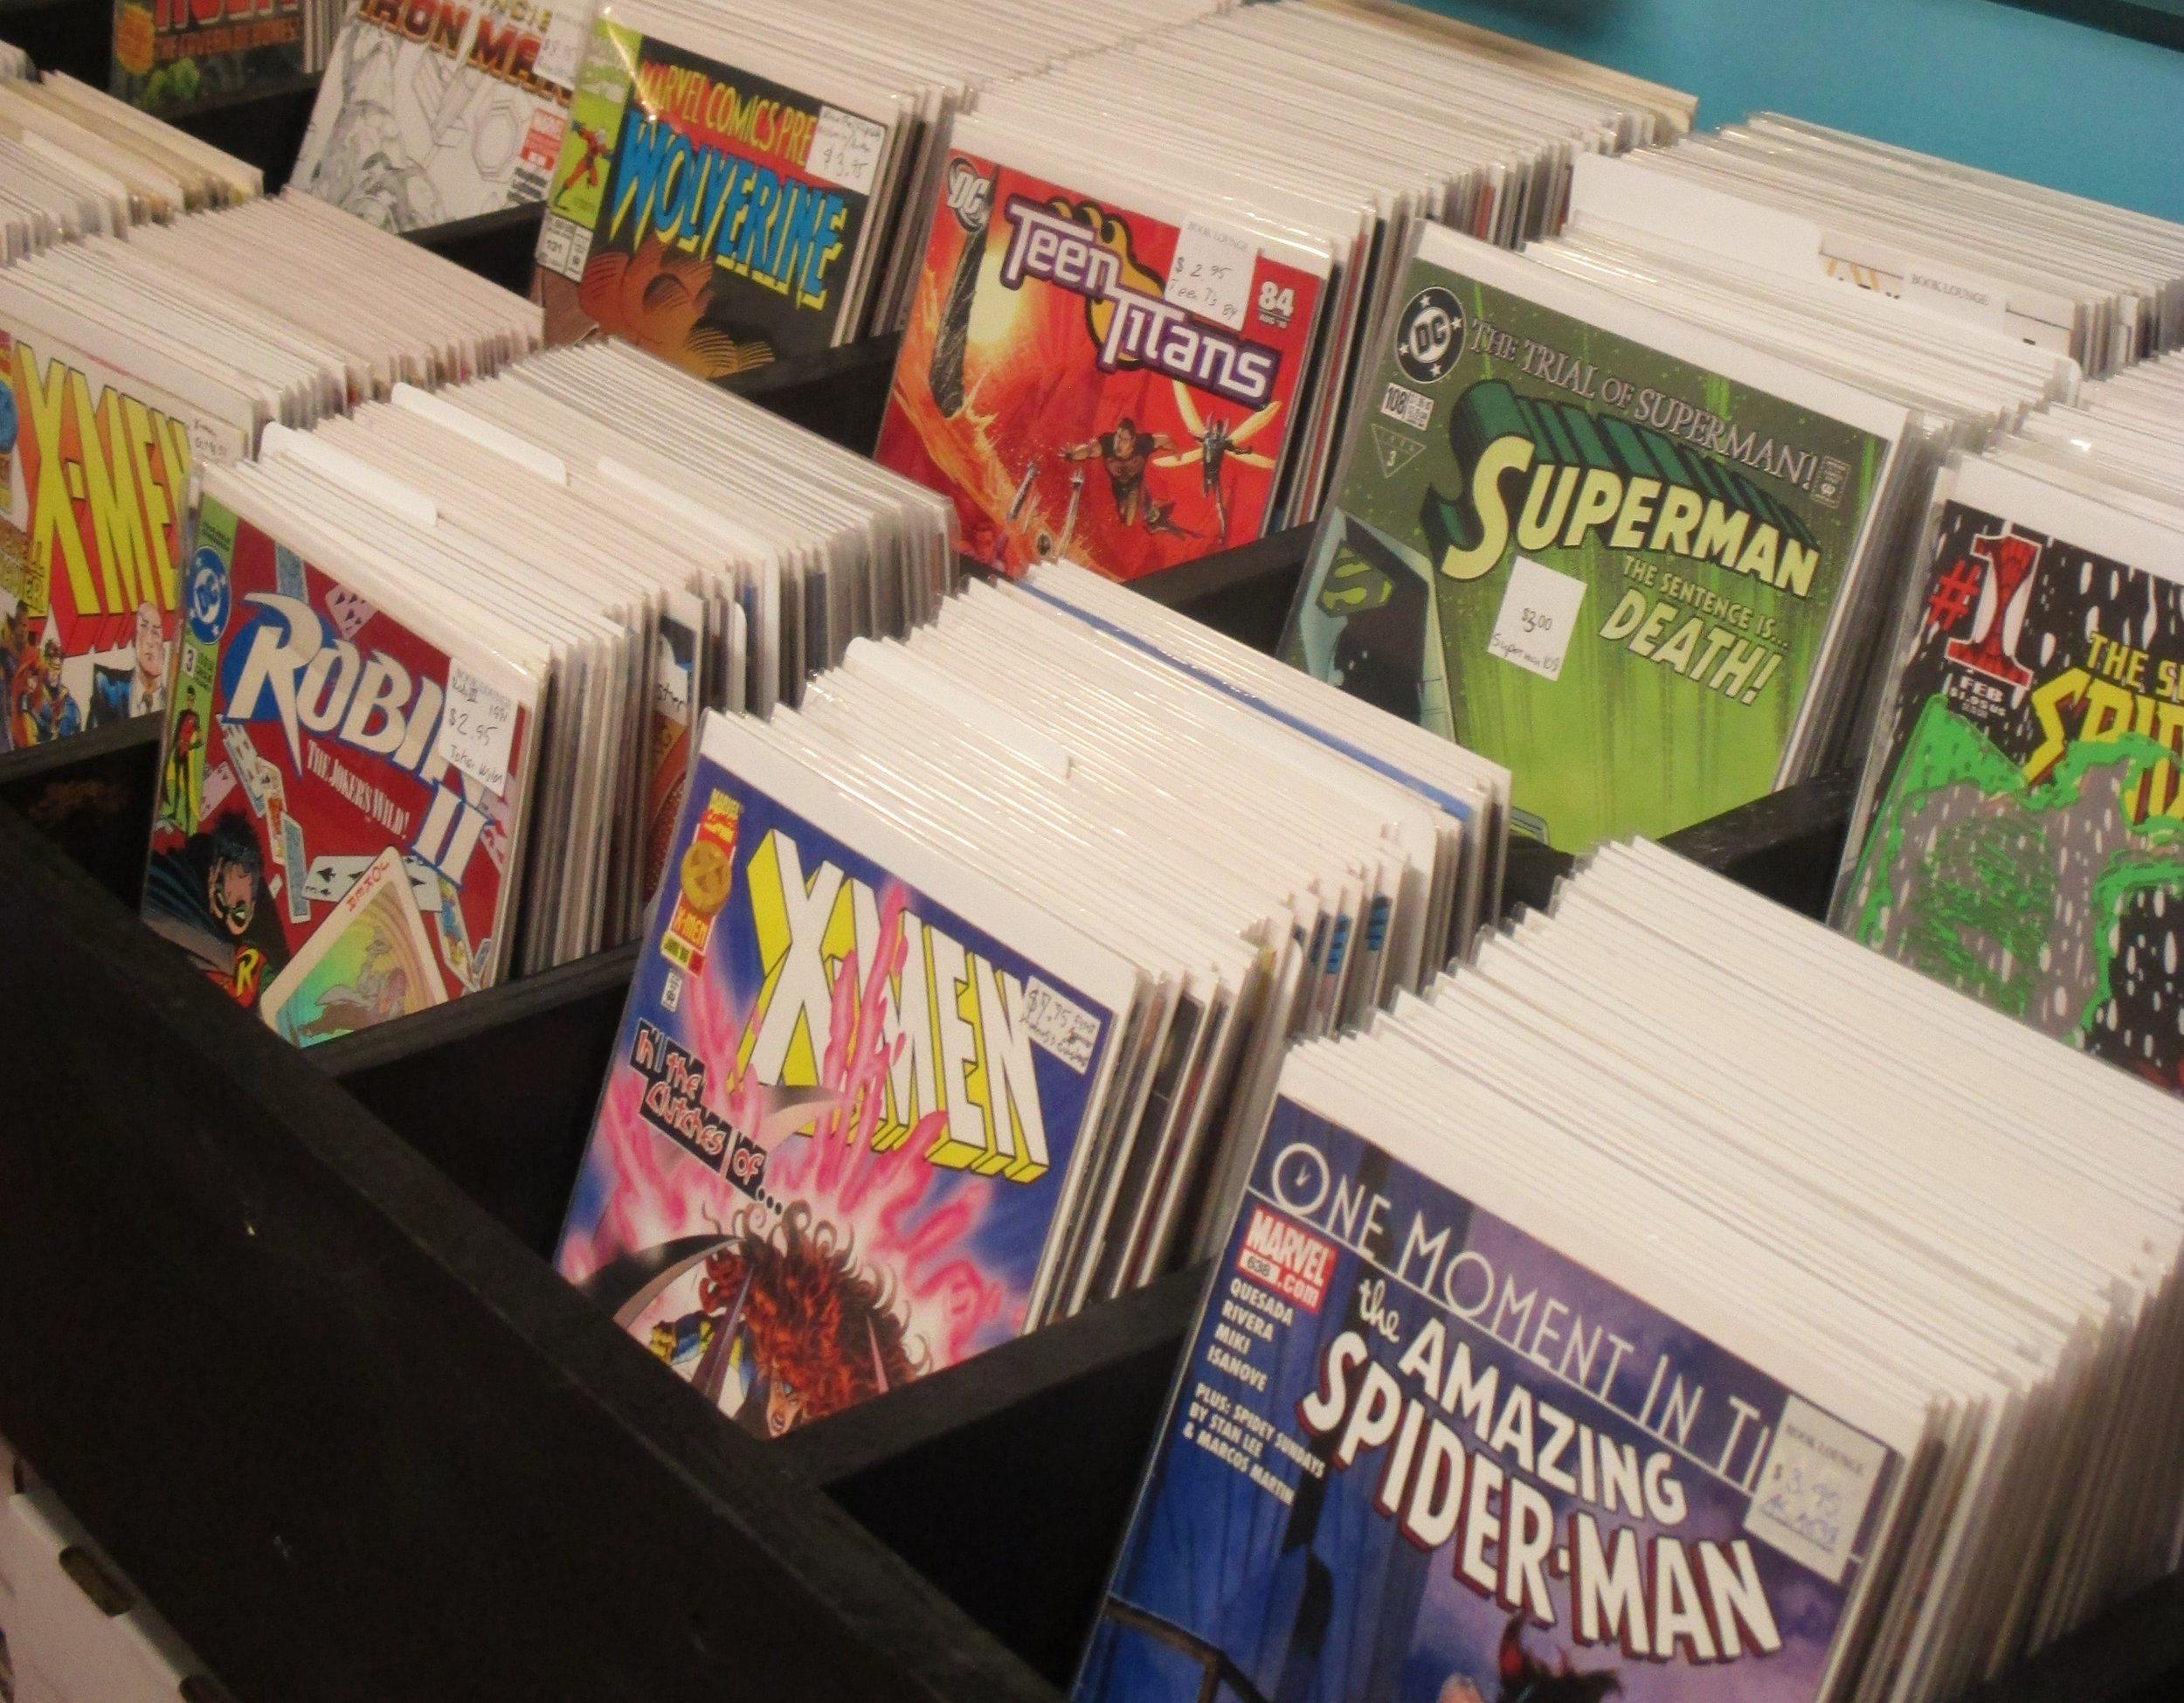 Comics - All comics are individually priced